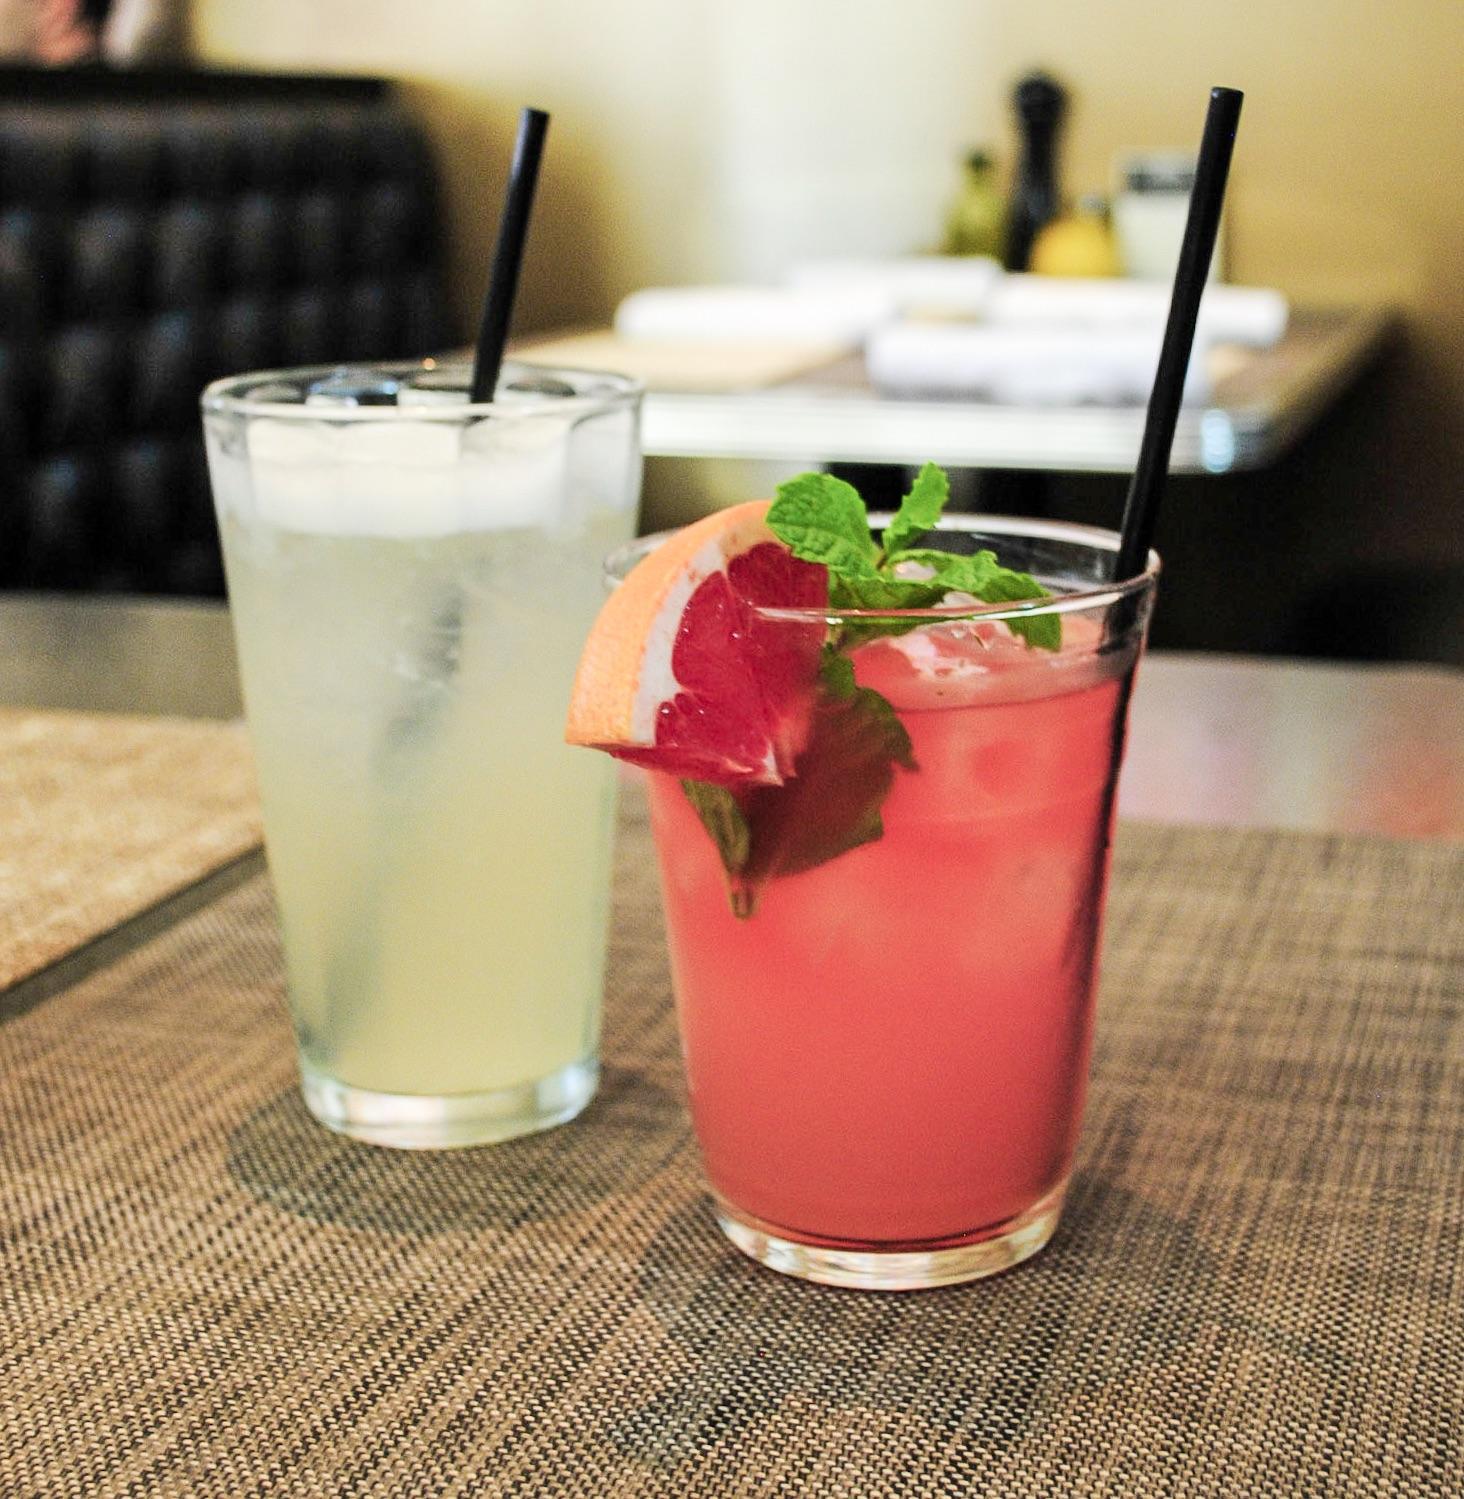 Lemonade and The Greyhound, Ingo's Tasty Diner, Santa Monica, CA